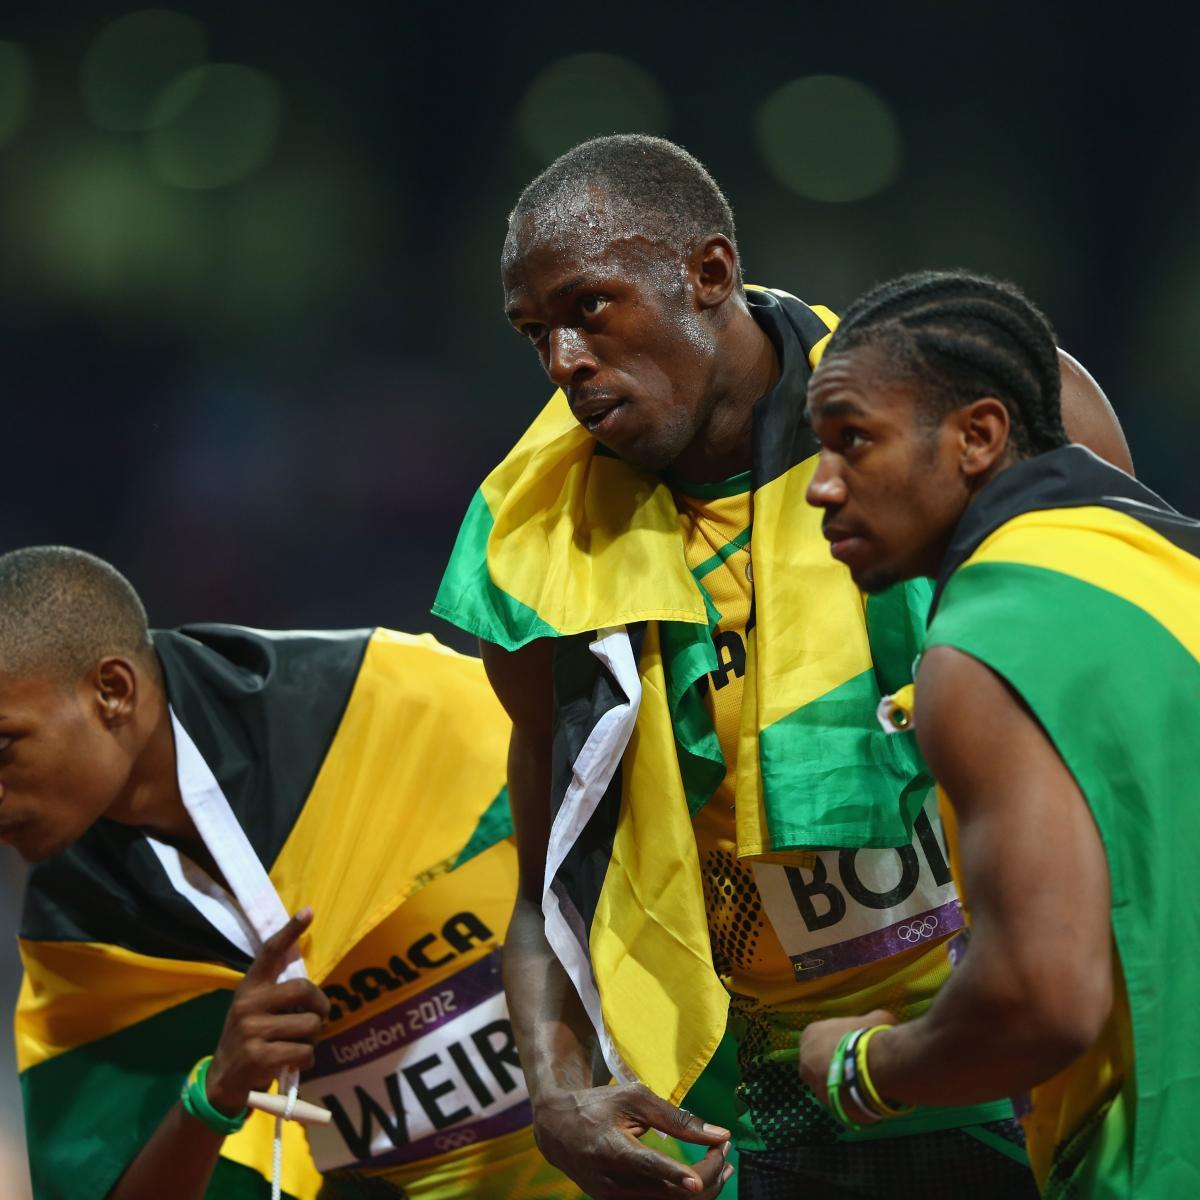 London 2012 Track and Field Men's 200m: Jamaica Dominates ...